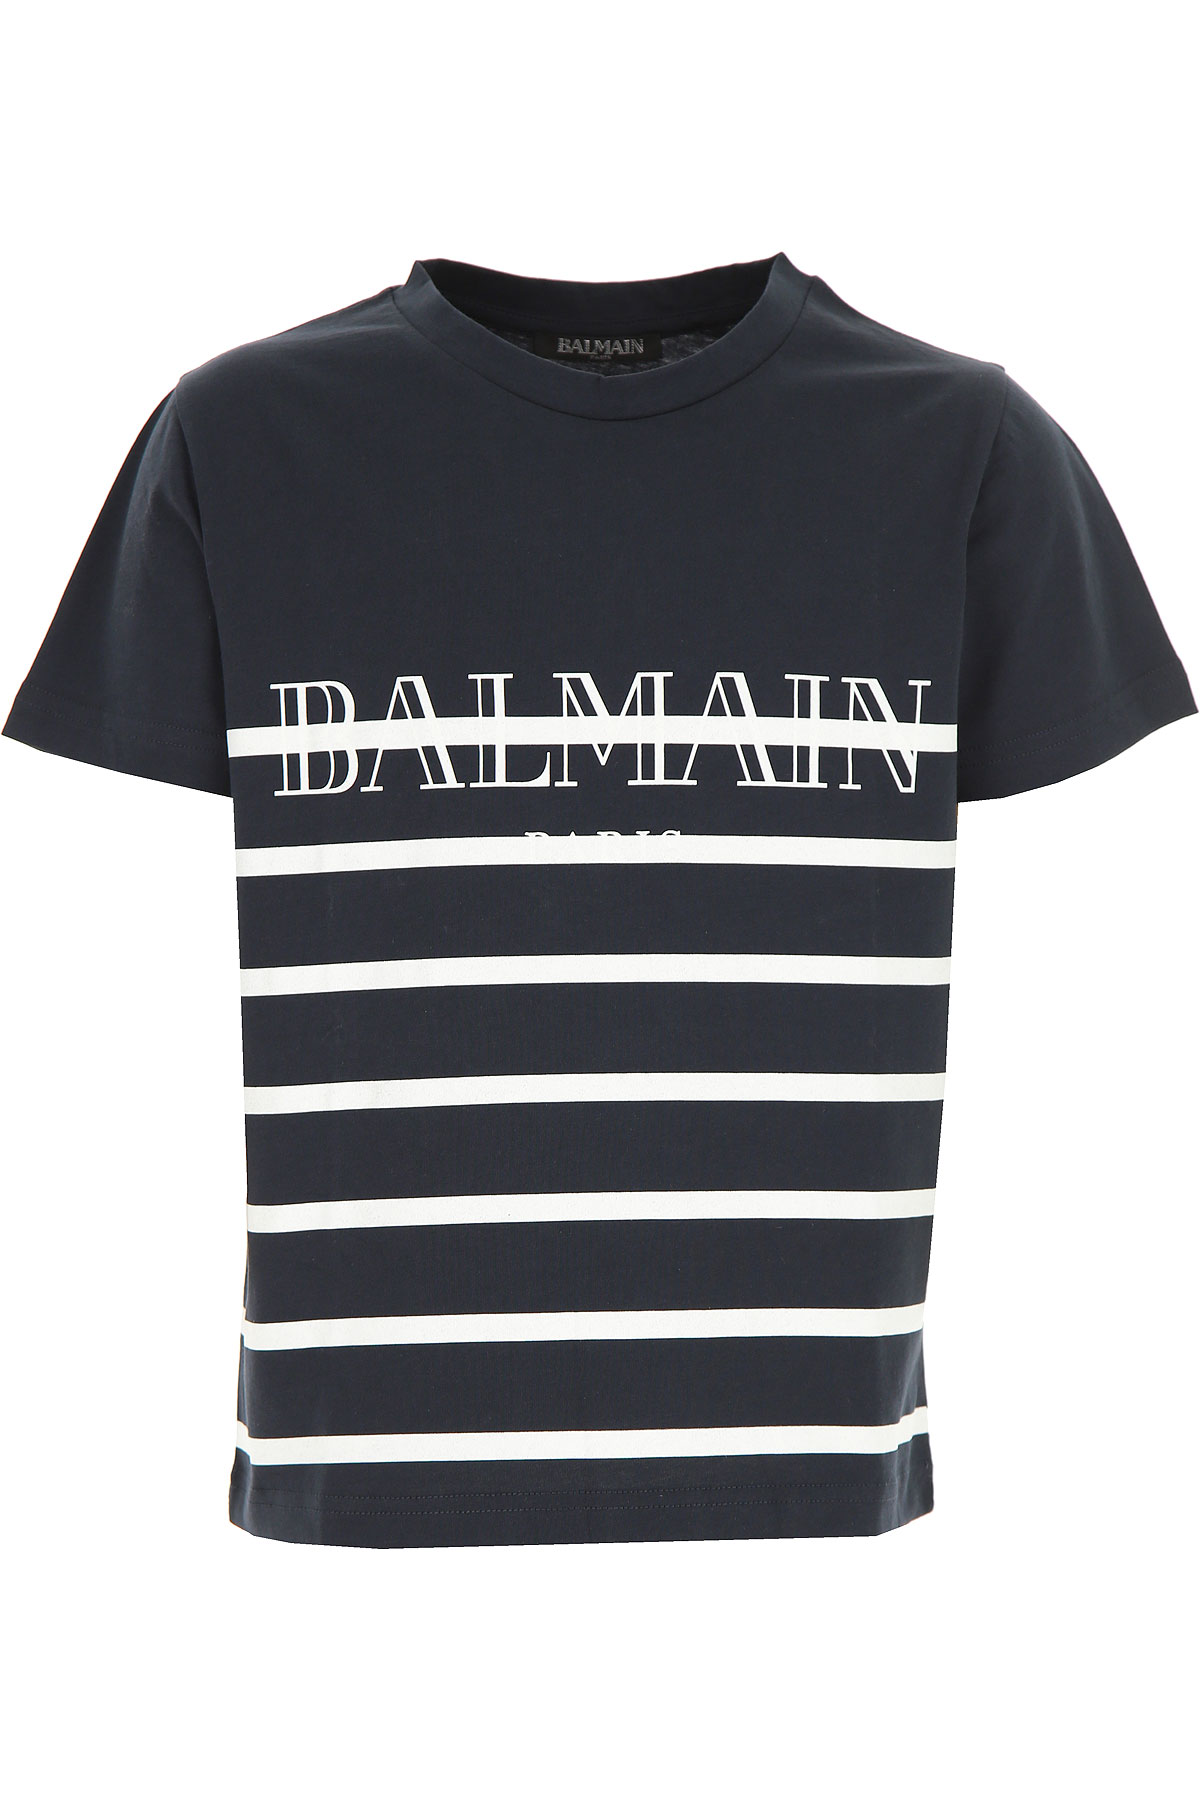 Image of Balmain Kids T-Shirt for Boys, Blue, Cotton, 2017, 10Y 14Y 8Y